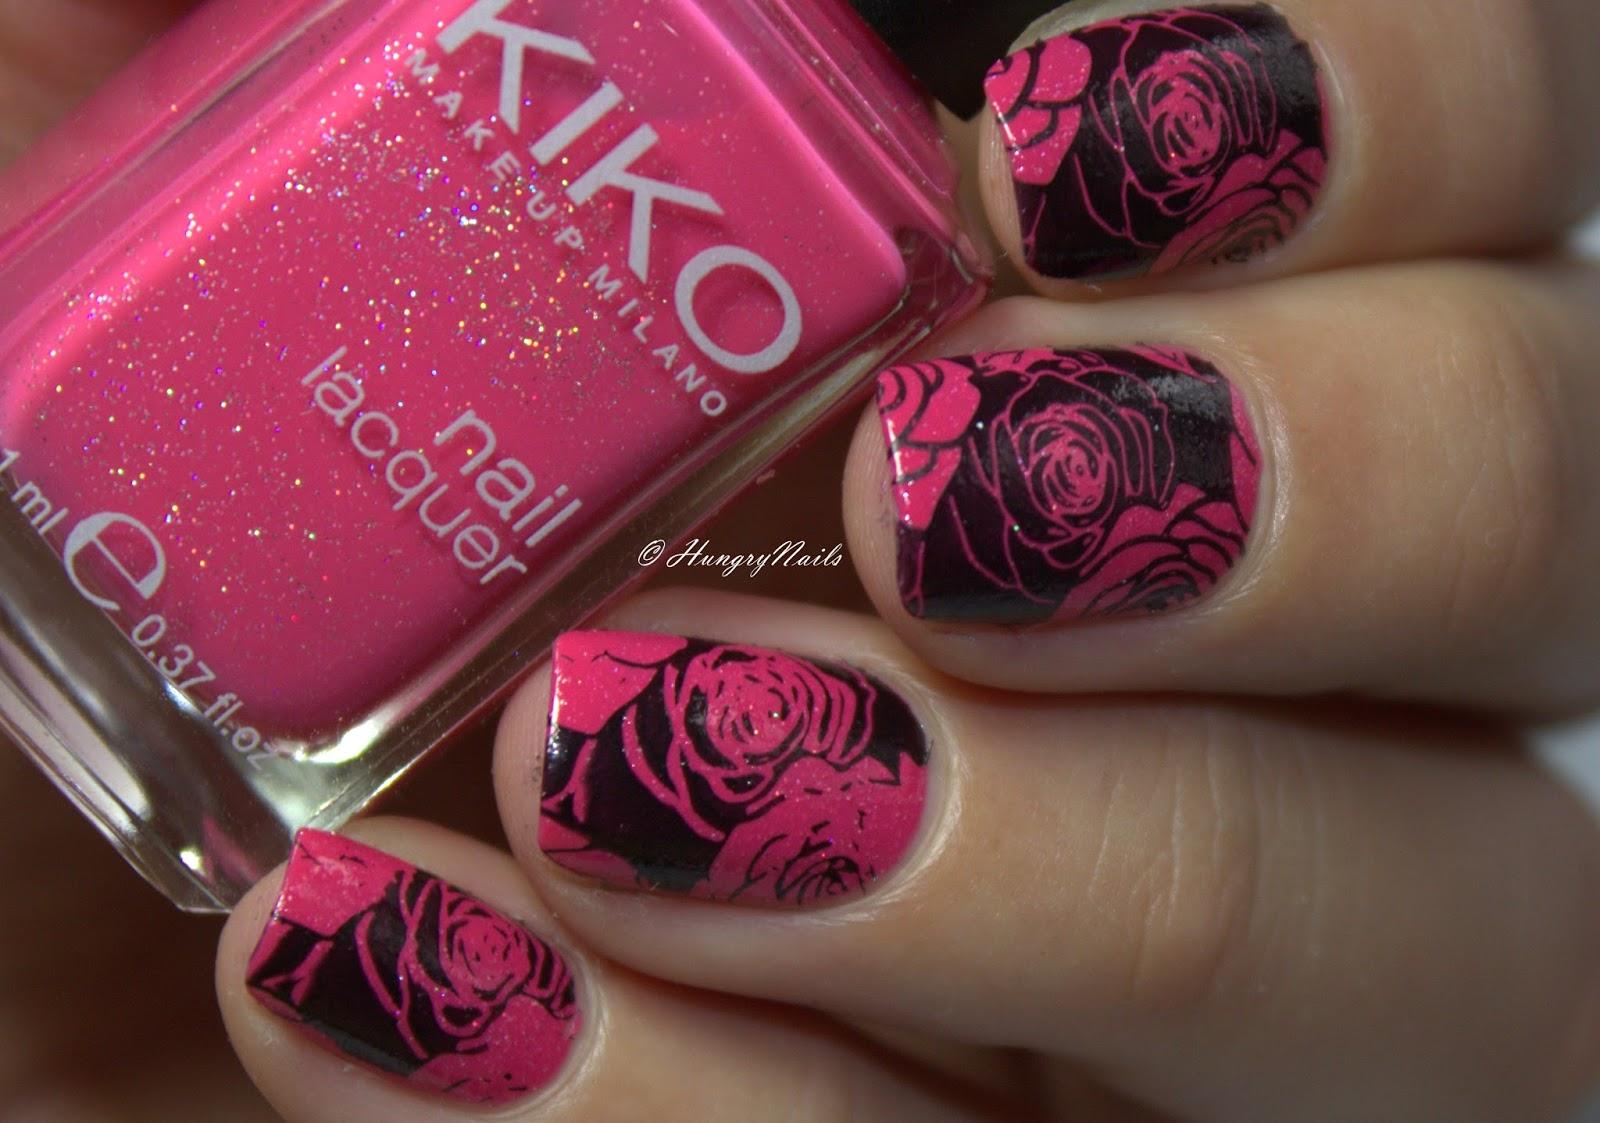 http://hungrynails.blogspot.de/2016/08/kiko-504-pearly-glaze-pink.html